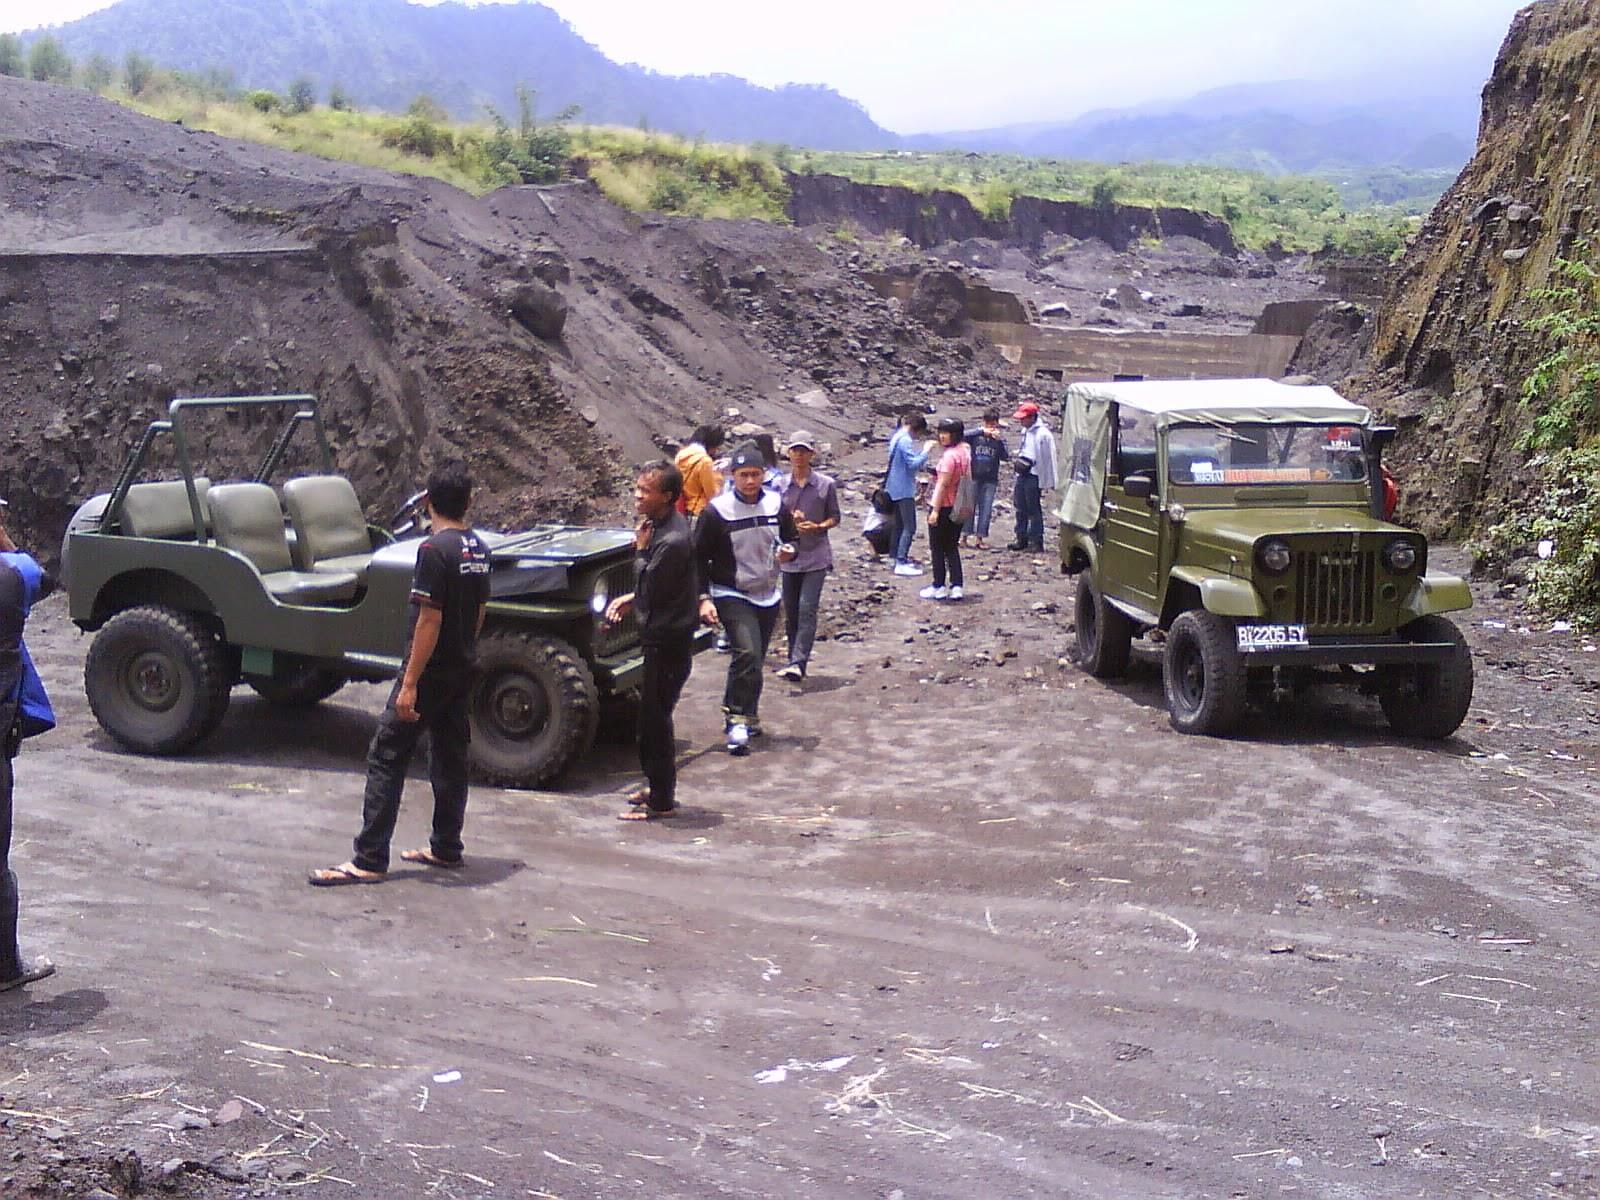 Outbound Semarang - WISATA LAVA TOUR MERAPI